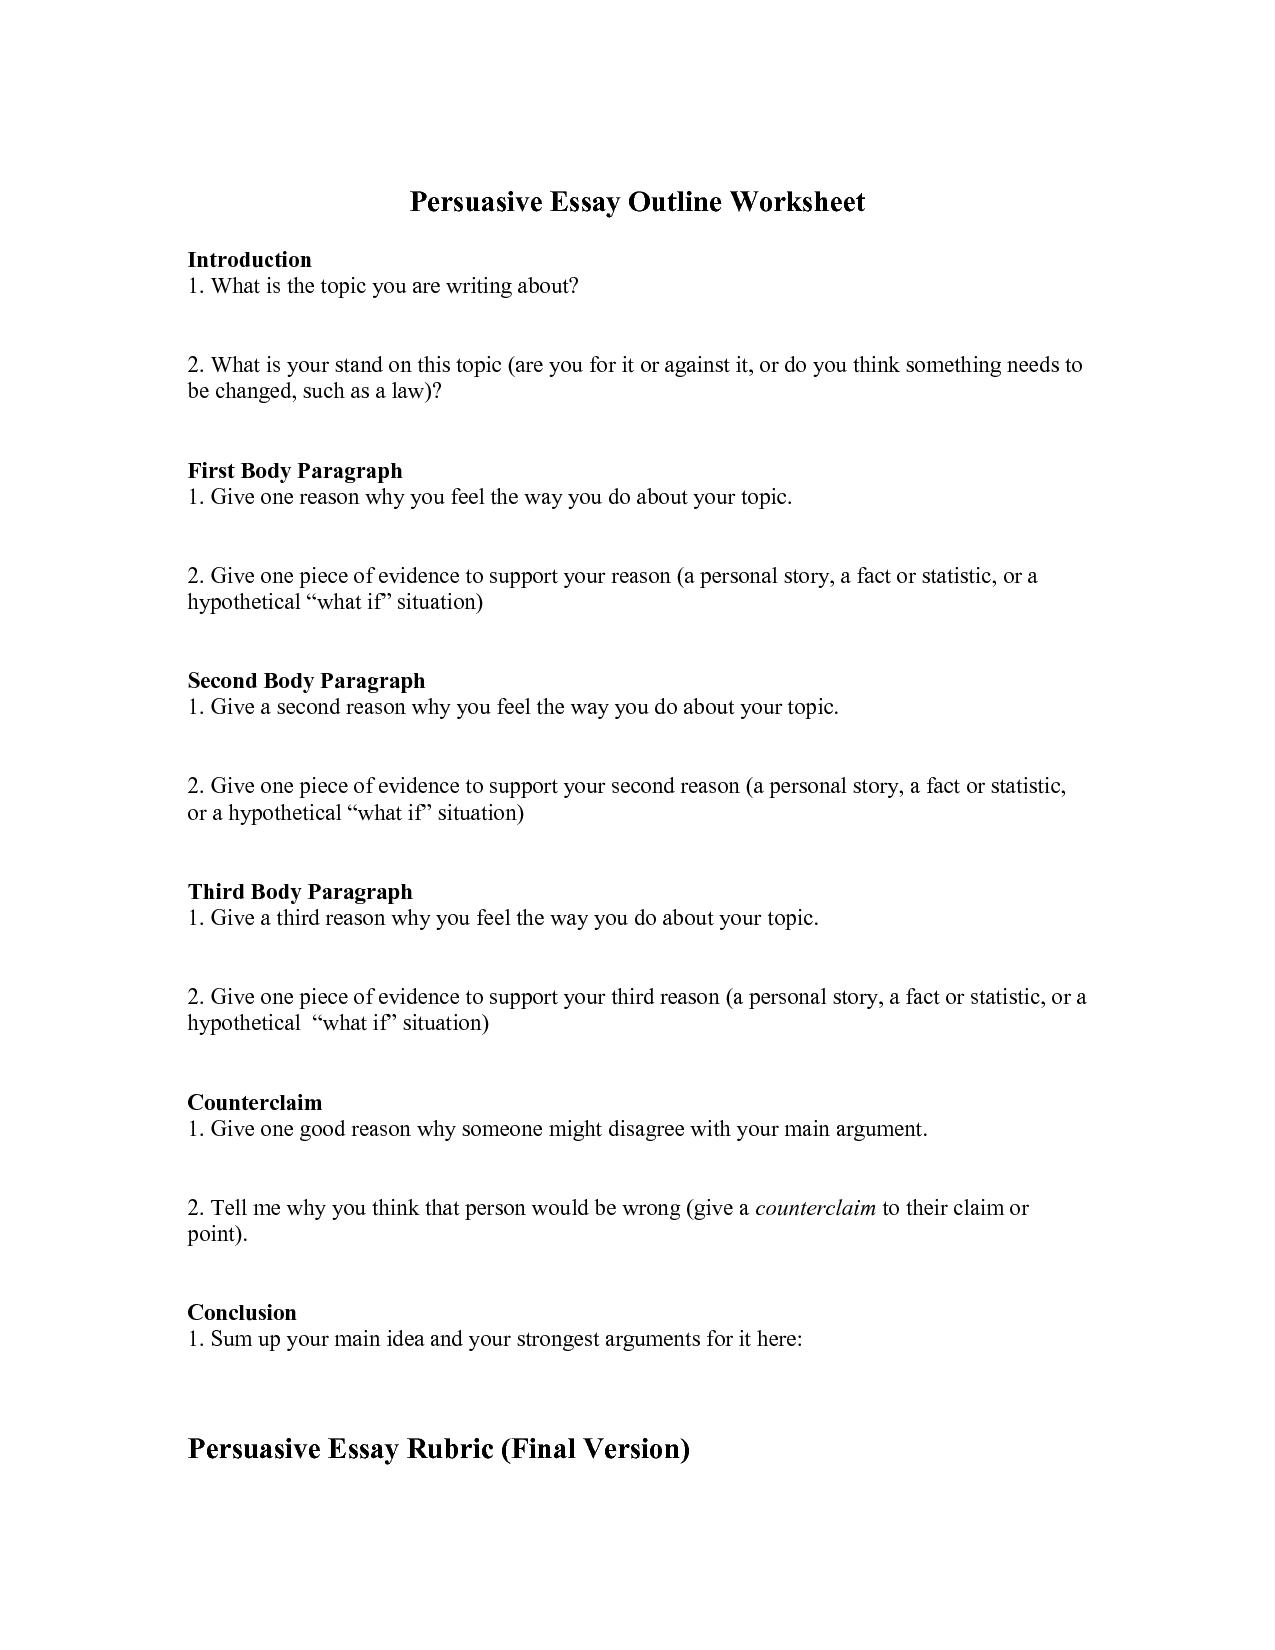 Service quality dissertation